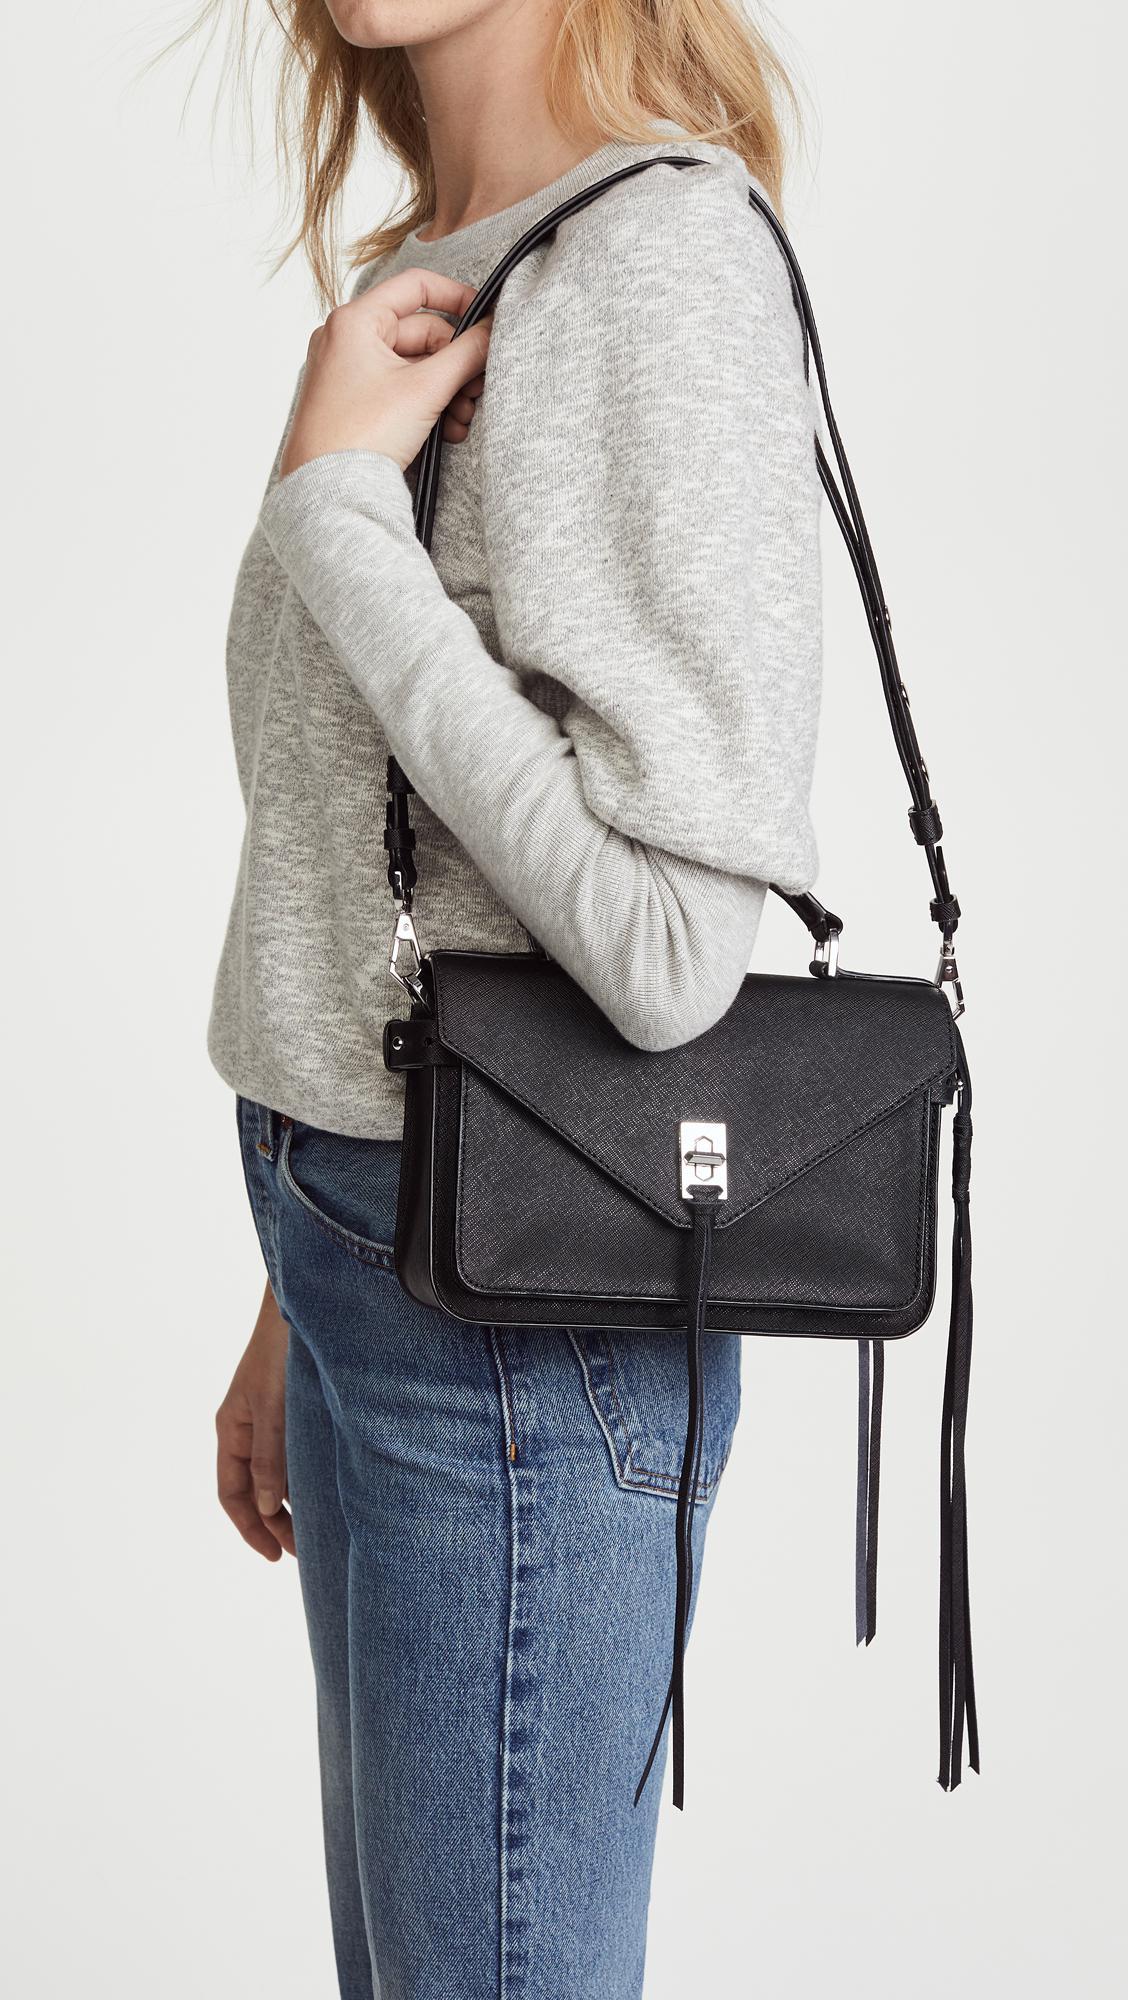 c0ca84432b9c53 Rebecca Minkoff Small Darren Messenger Bag in Black - Lyst